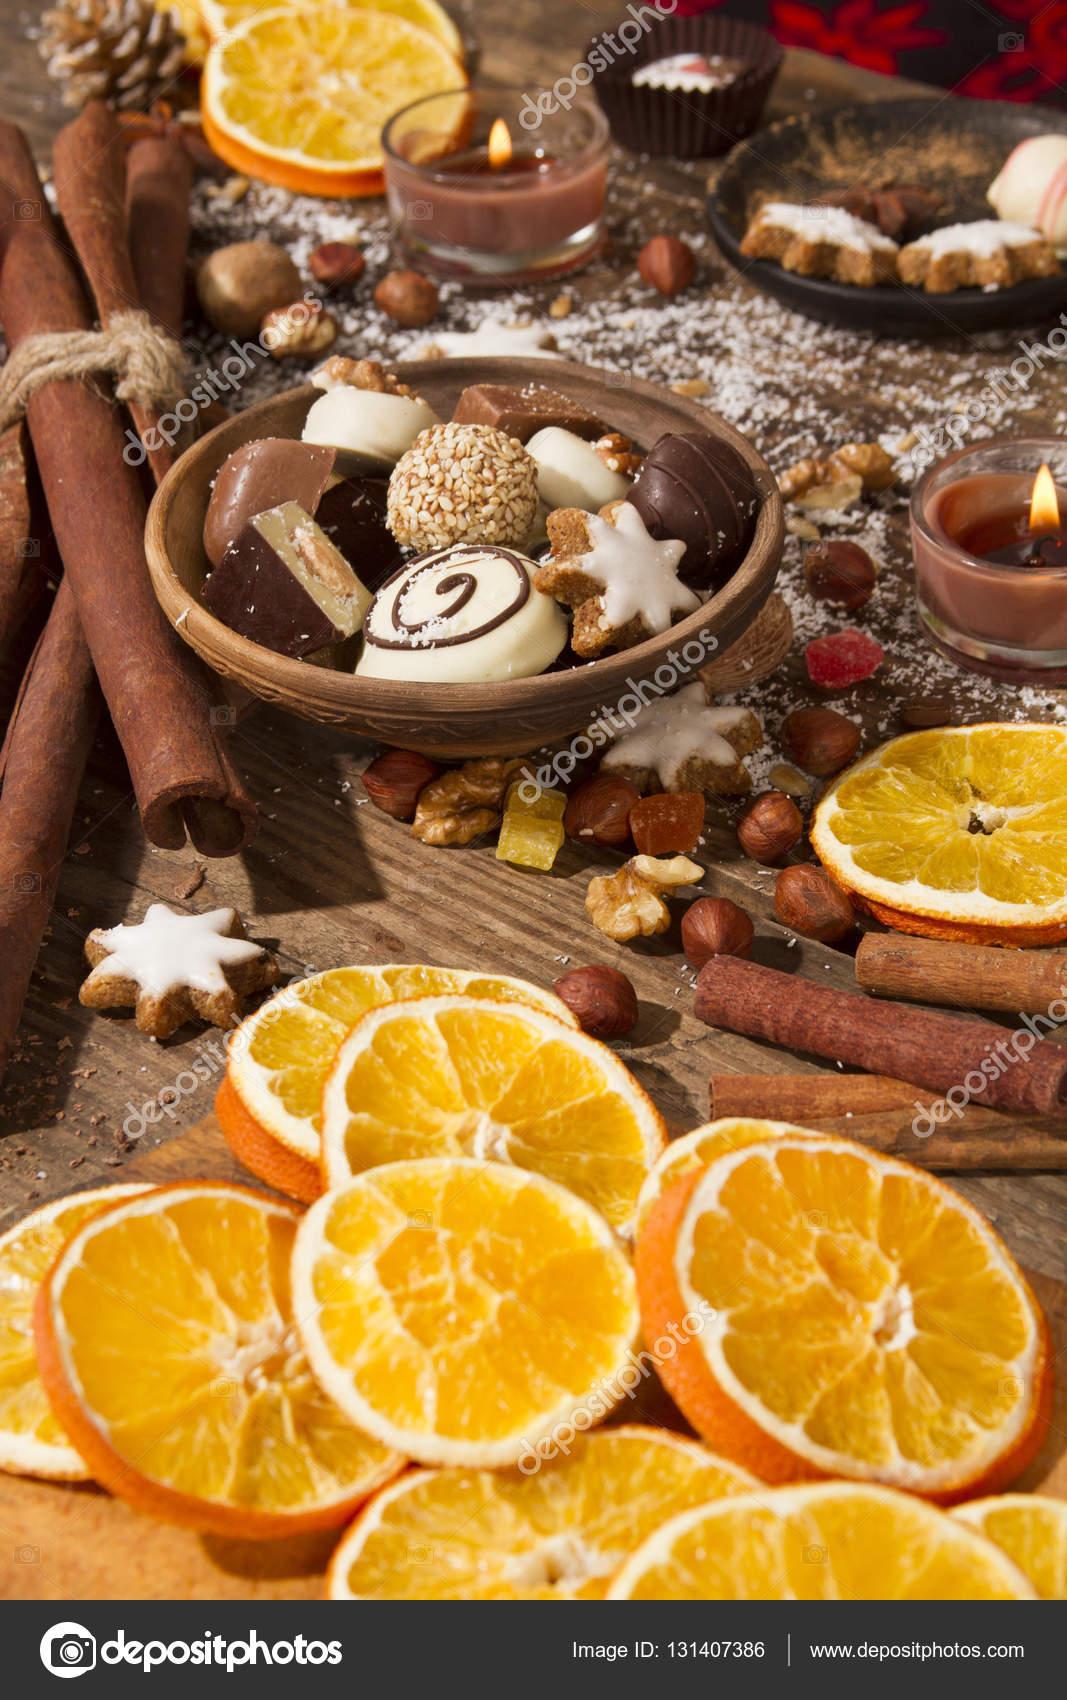 Decorazioni Natalizie Con Arance Essiccate.Decorazione Di Natale Cibo Con Fette Di Arance Essiccate Foto